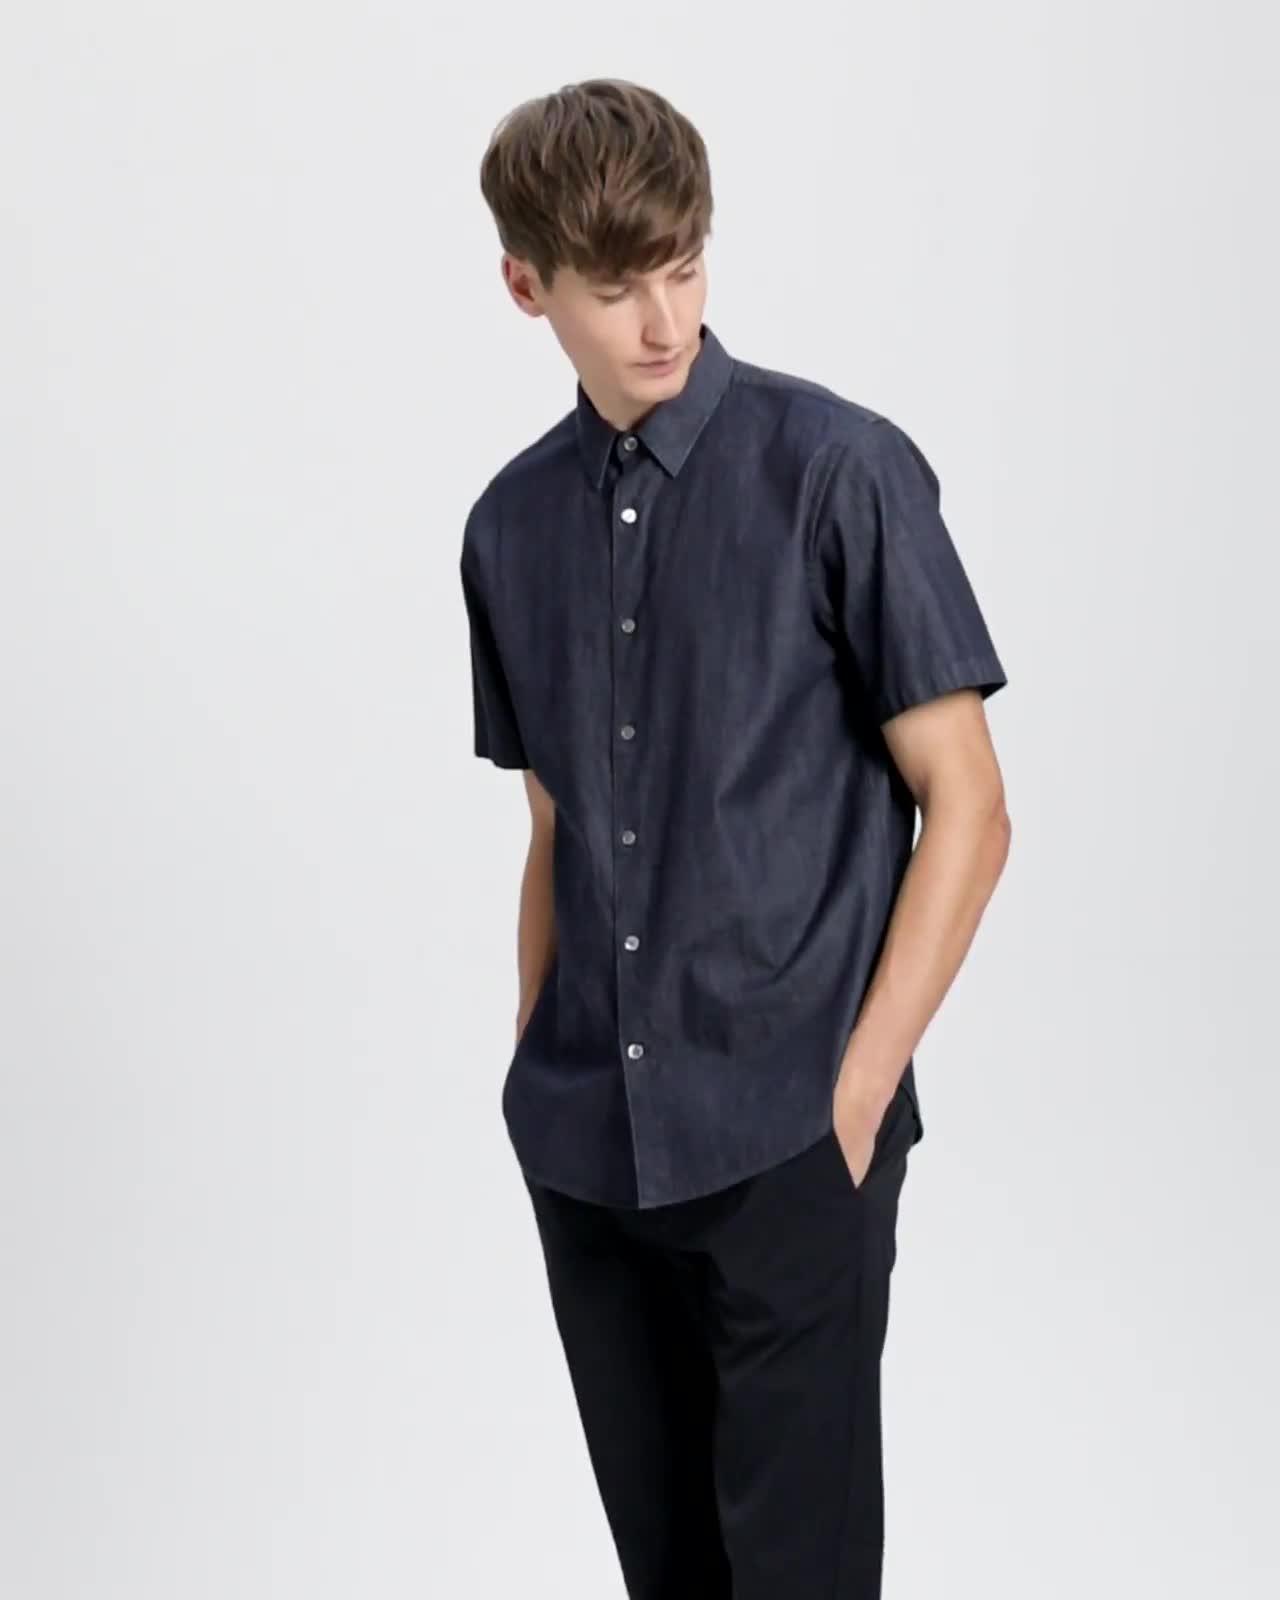 Relaxed Indigo Cotton Short-Sleeve Shirt